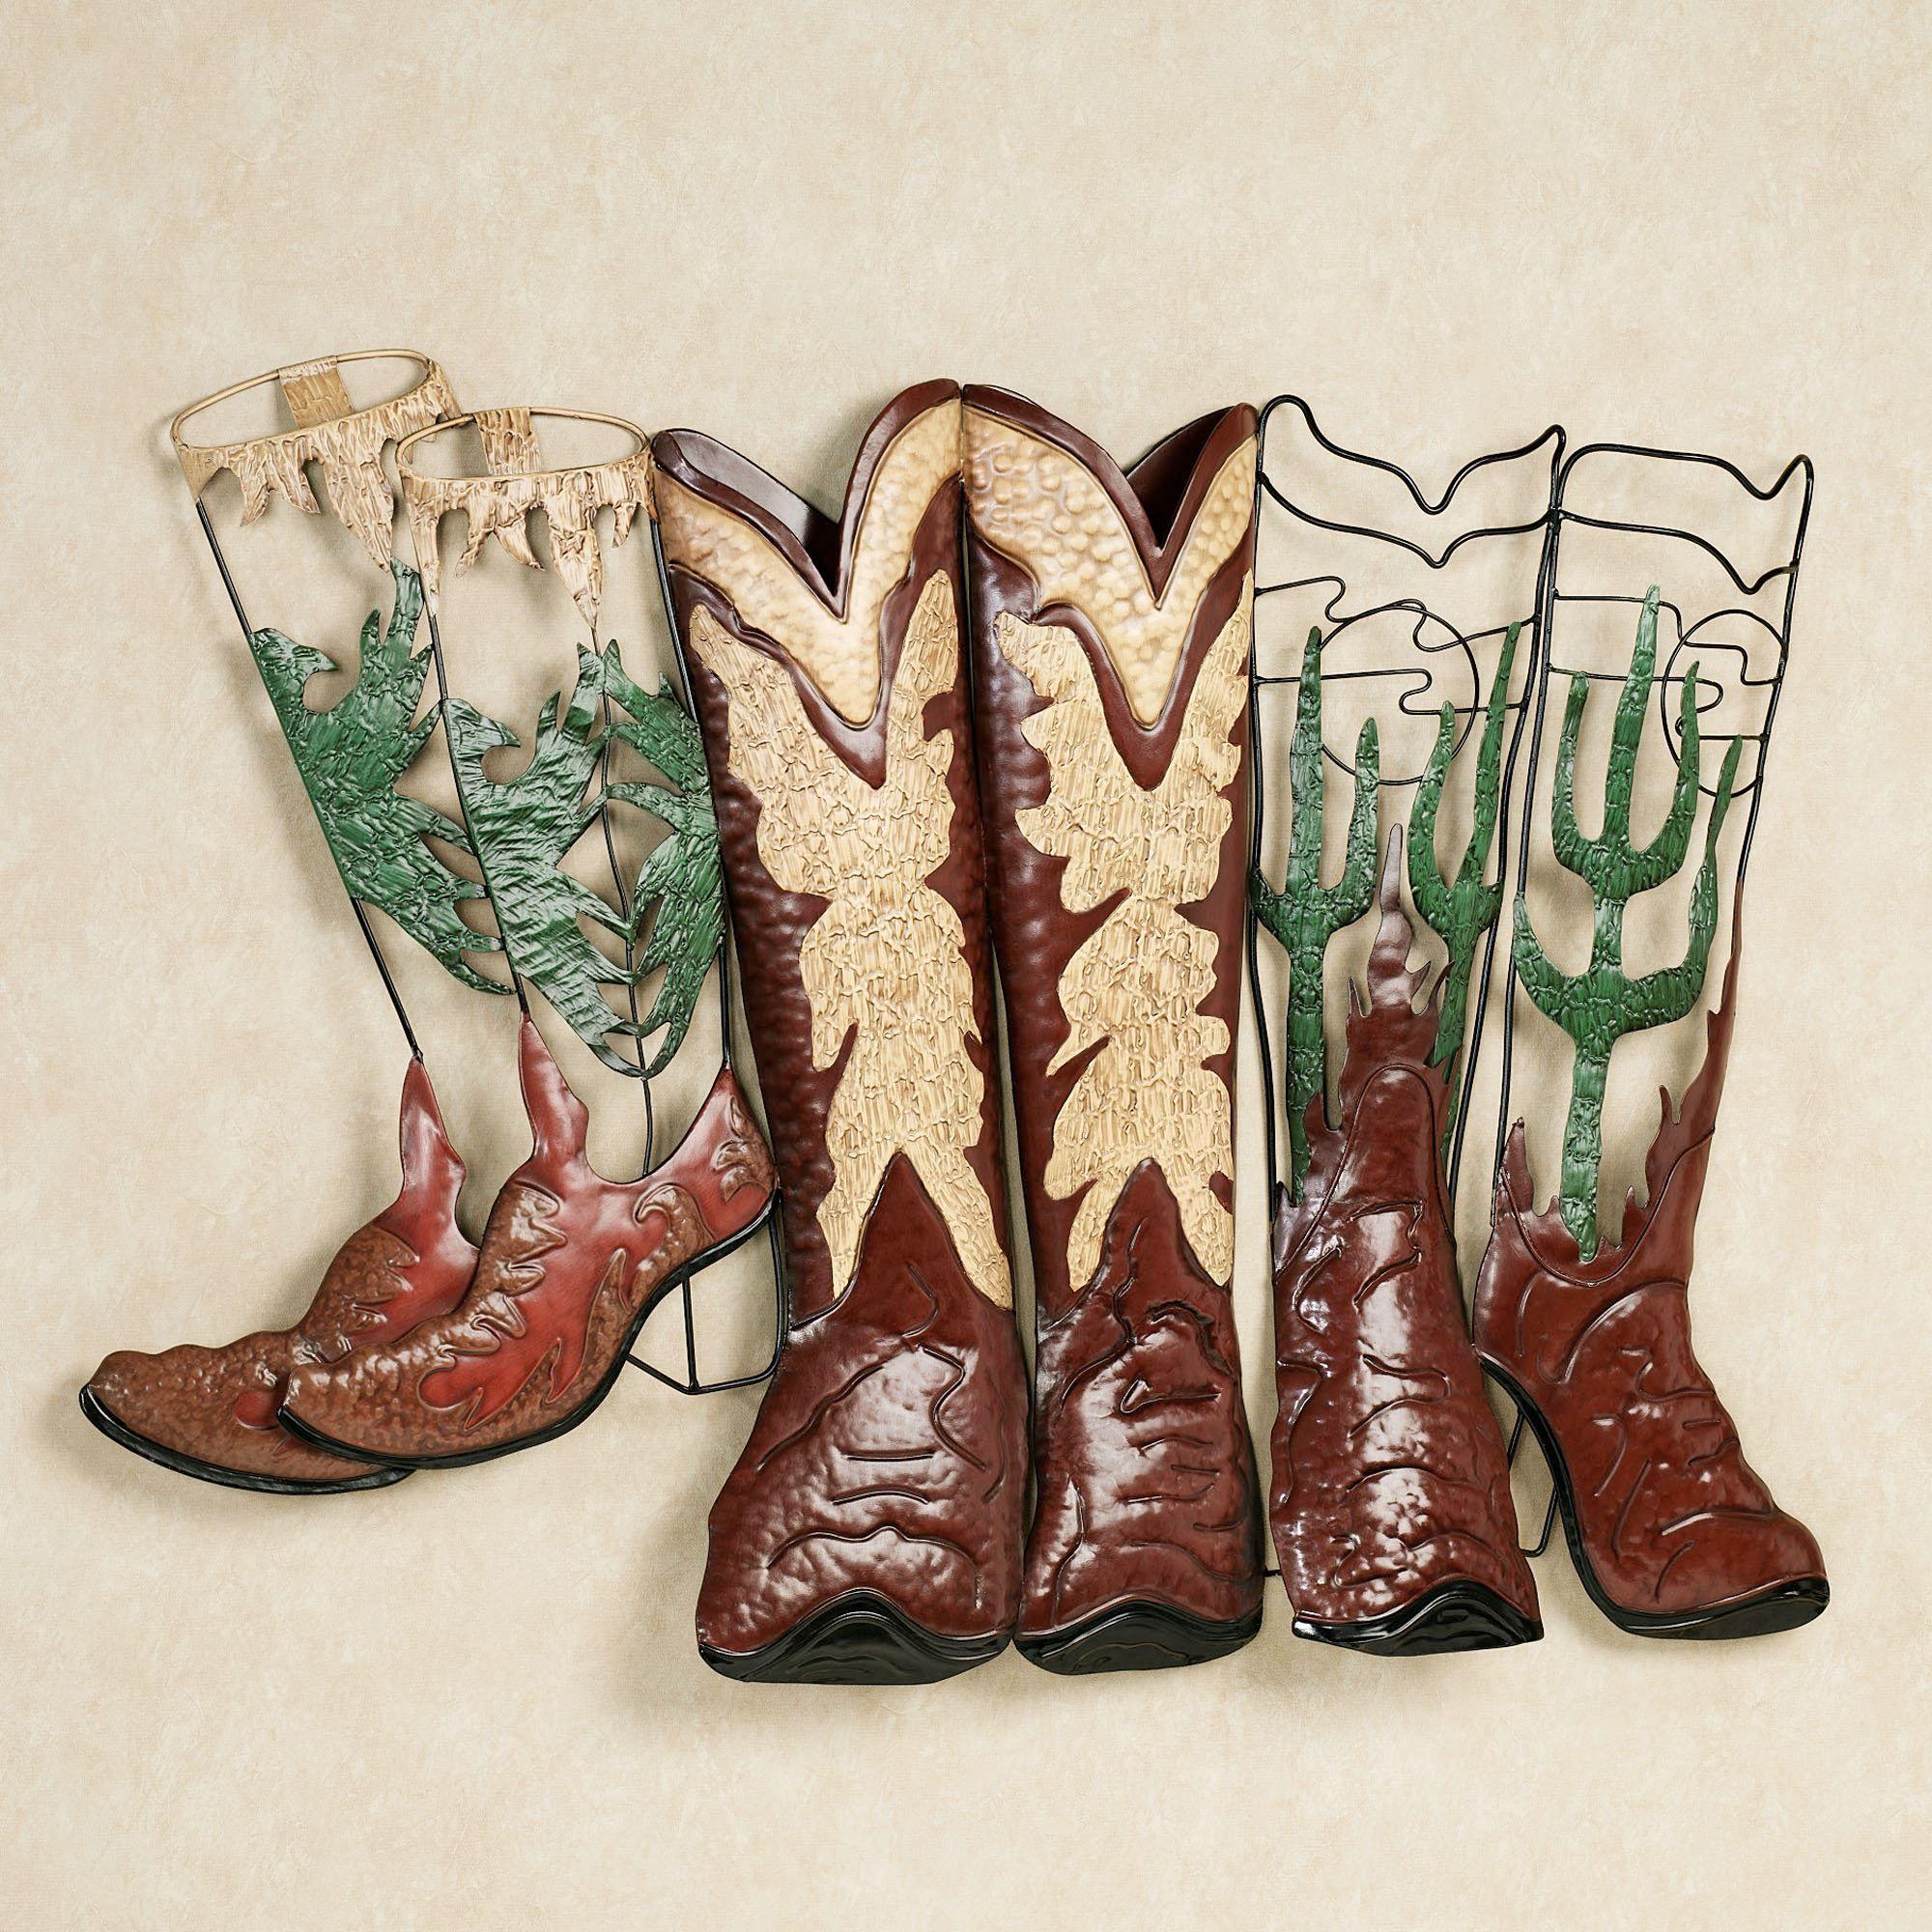 happy trails cowboy boots metal wall art sculpture rh touchofclass com cowboy boots at amazon uk mens cowboy boot attachment